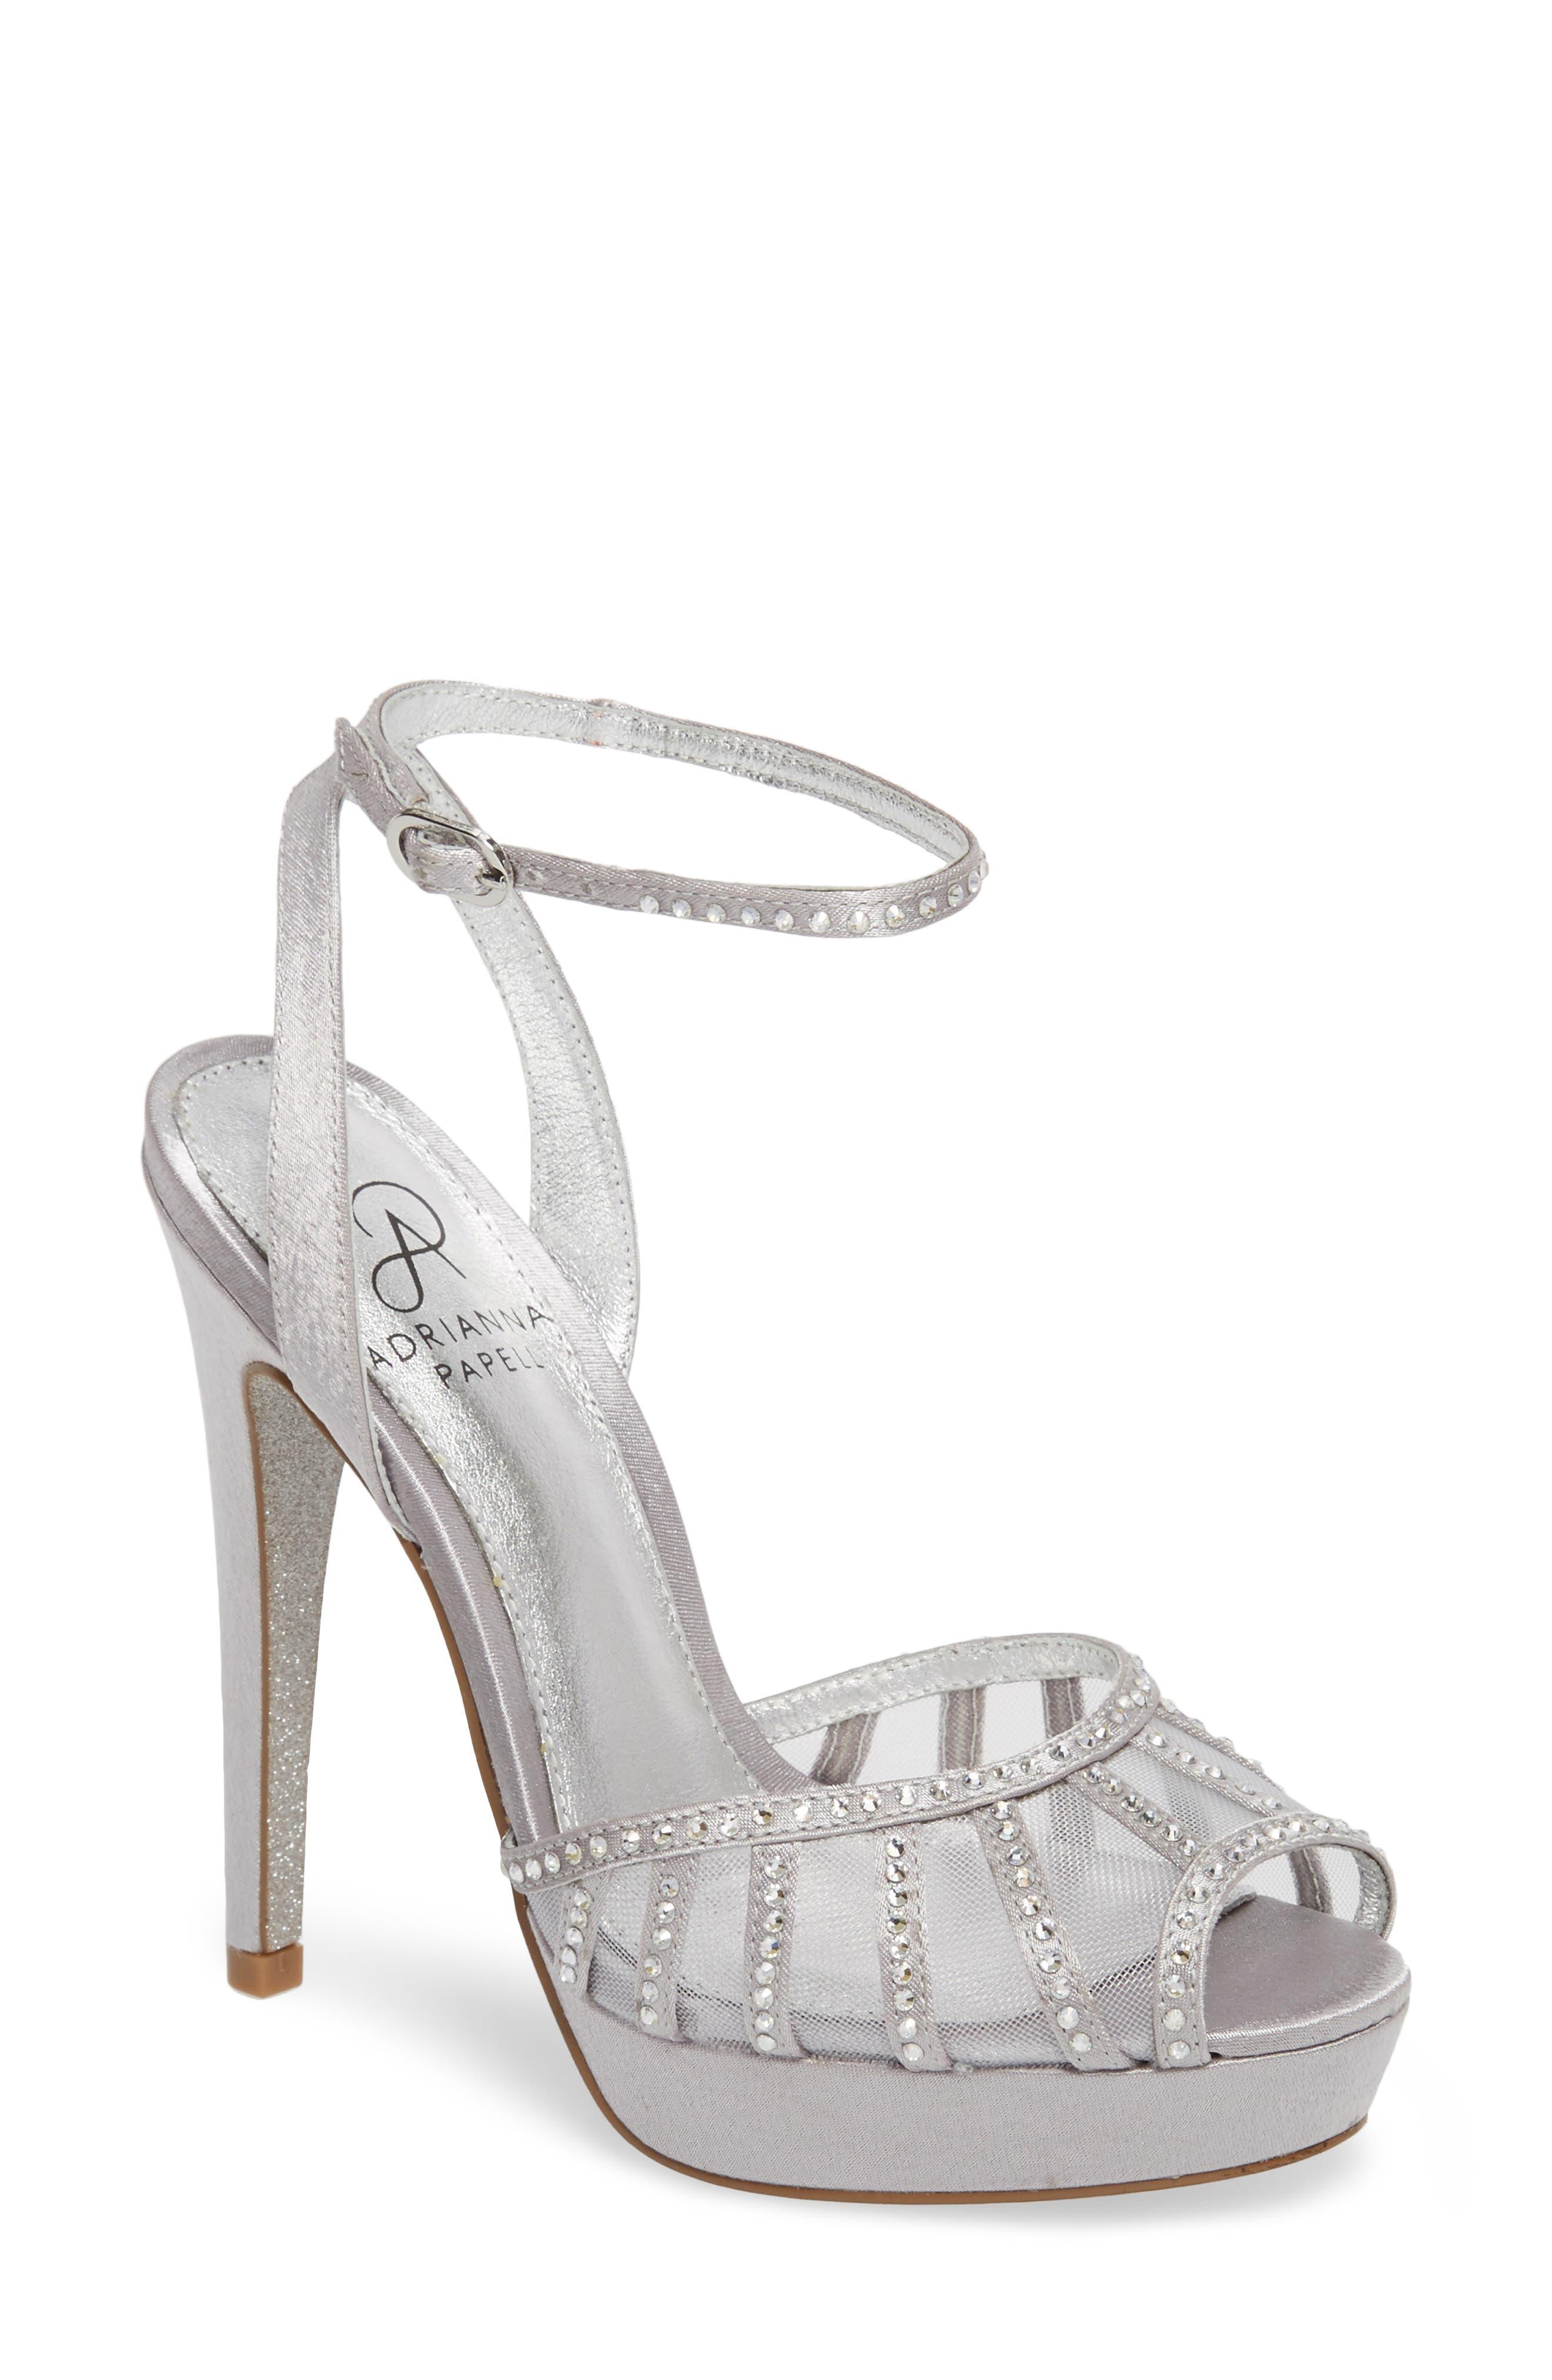 Simone Crystal Embellished Platform Sandal,                             Main thumbnail 2, color,